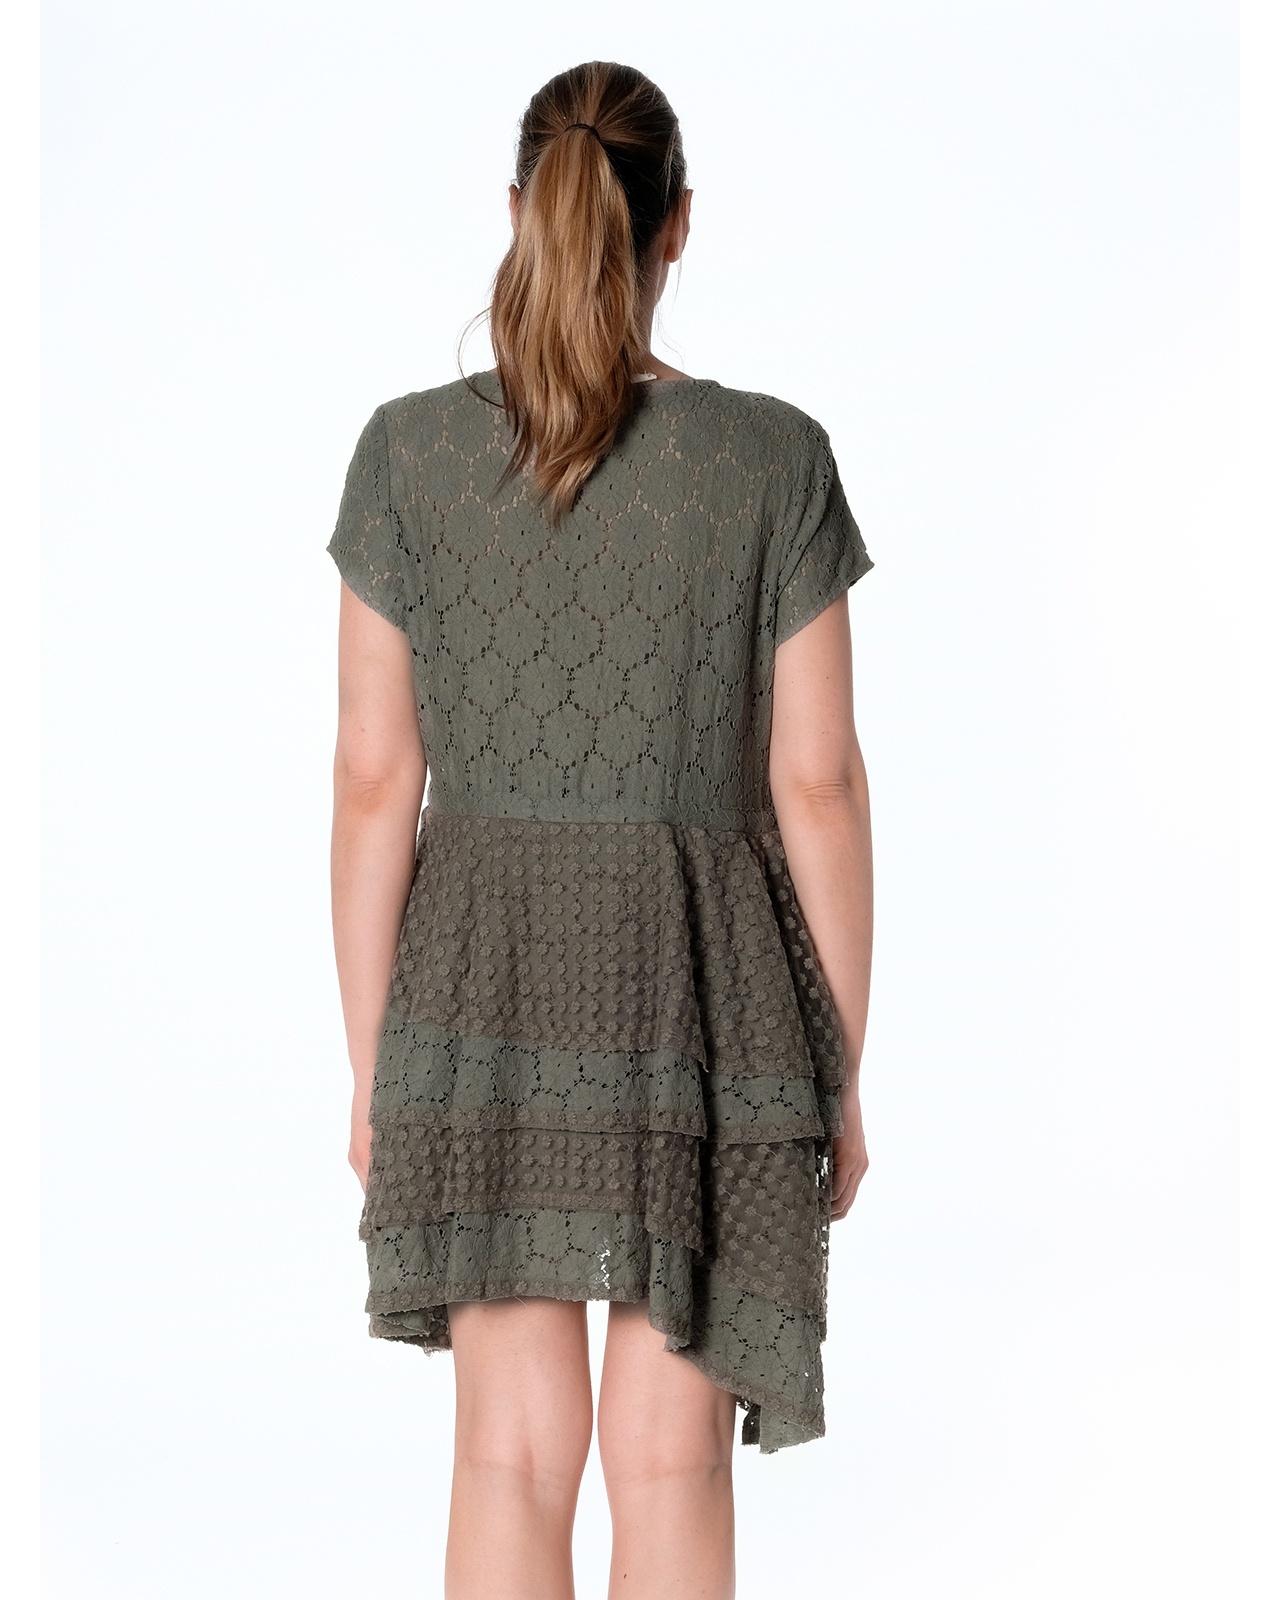 DRESS ANTIBES N°43 KAKI